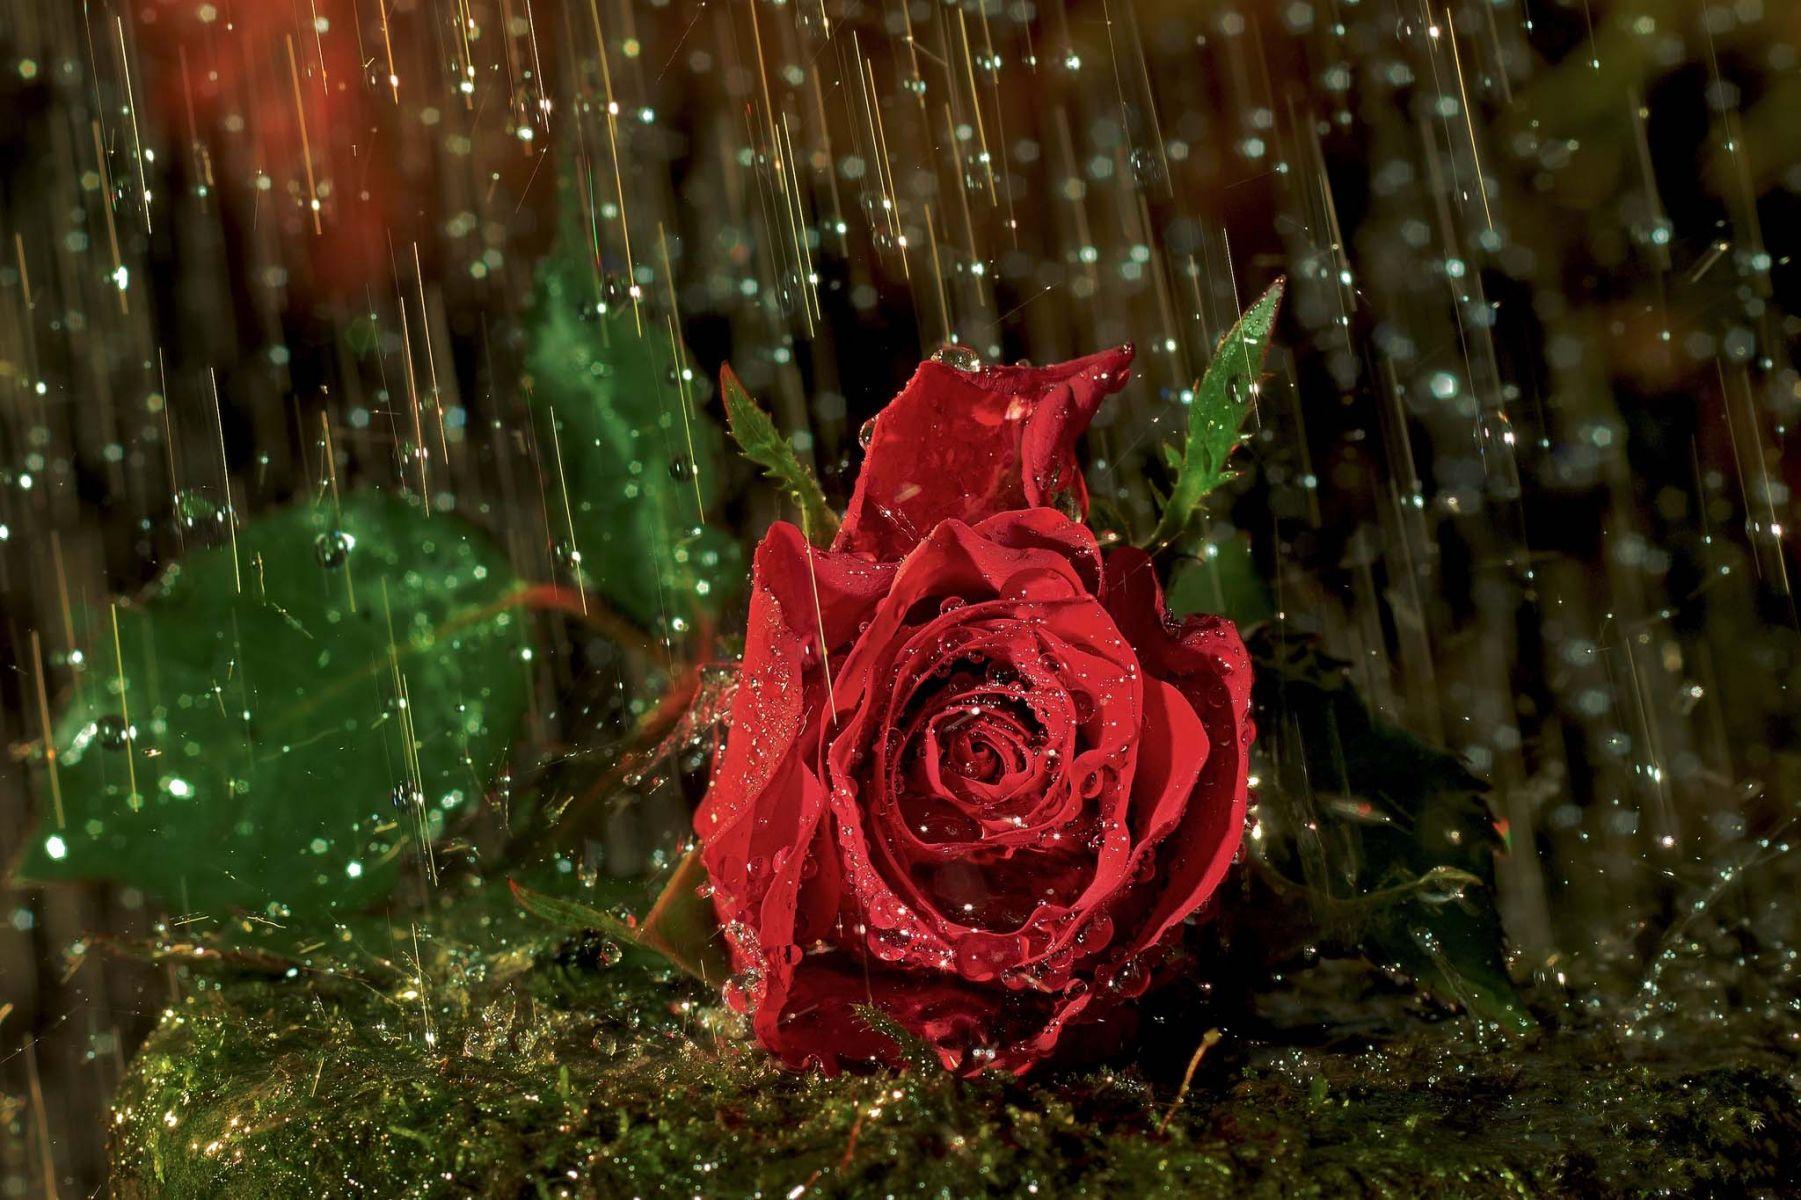 Beautiful Flower - Rainy Season Wallpaper Free Download , HD Wallpaper & Backgrounds